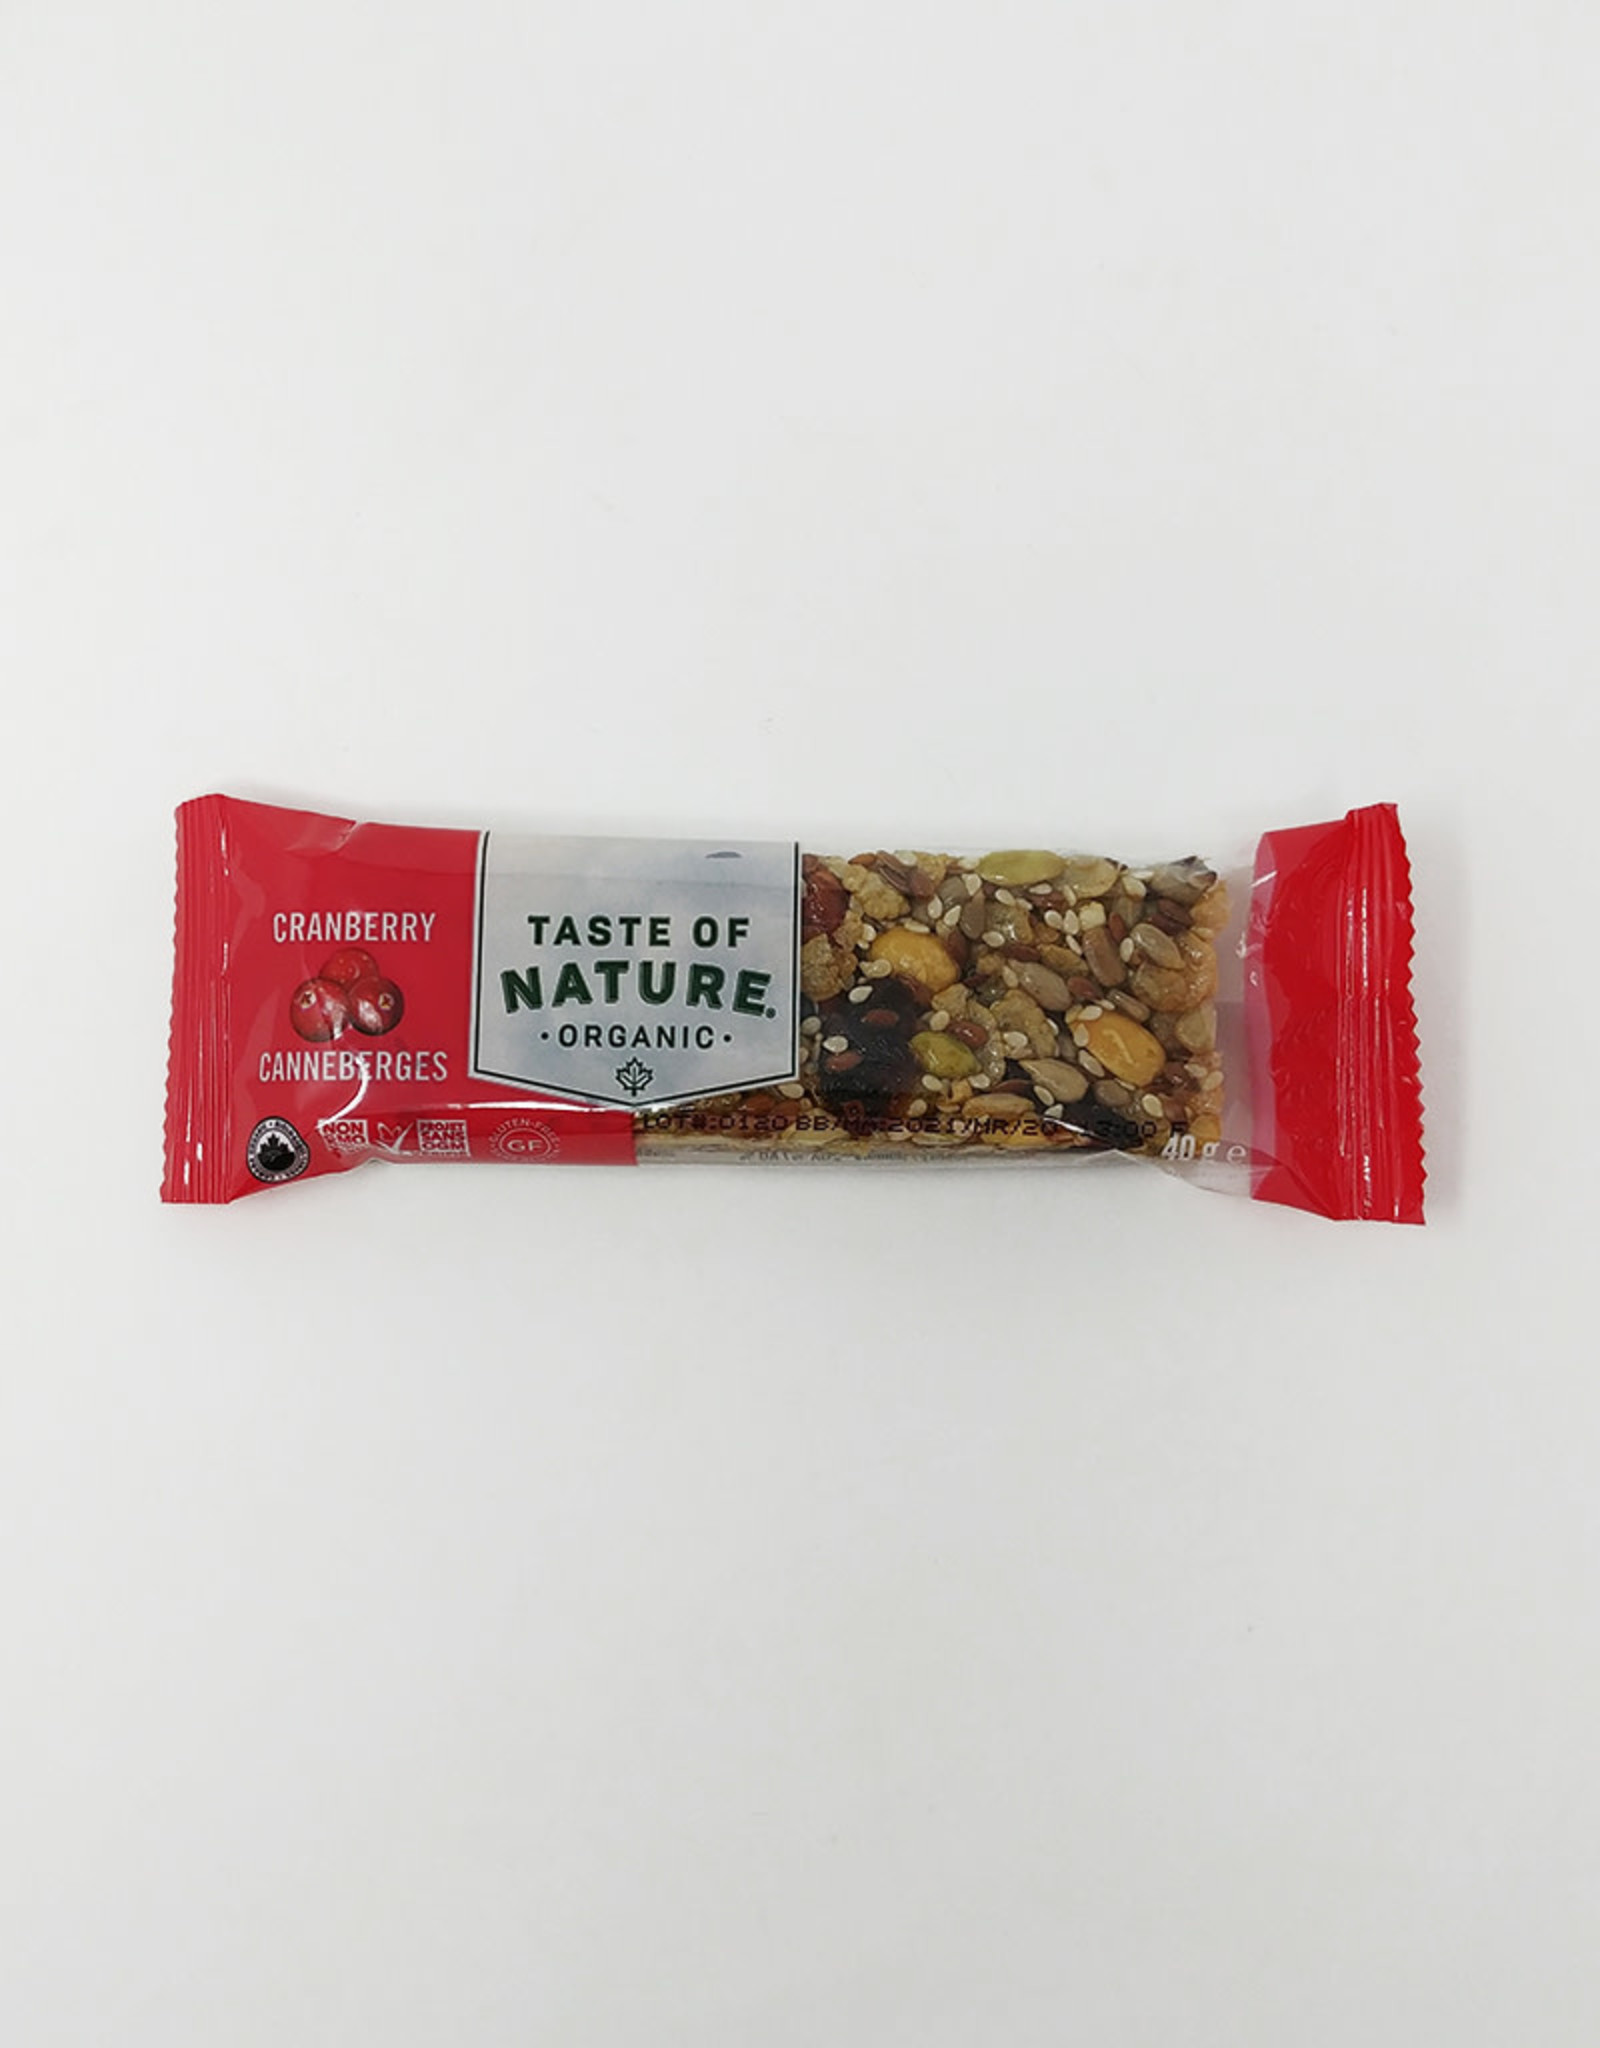 Taste of Nature Taste of Nature - Snack Bars, Cranberry